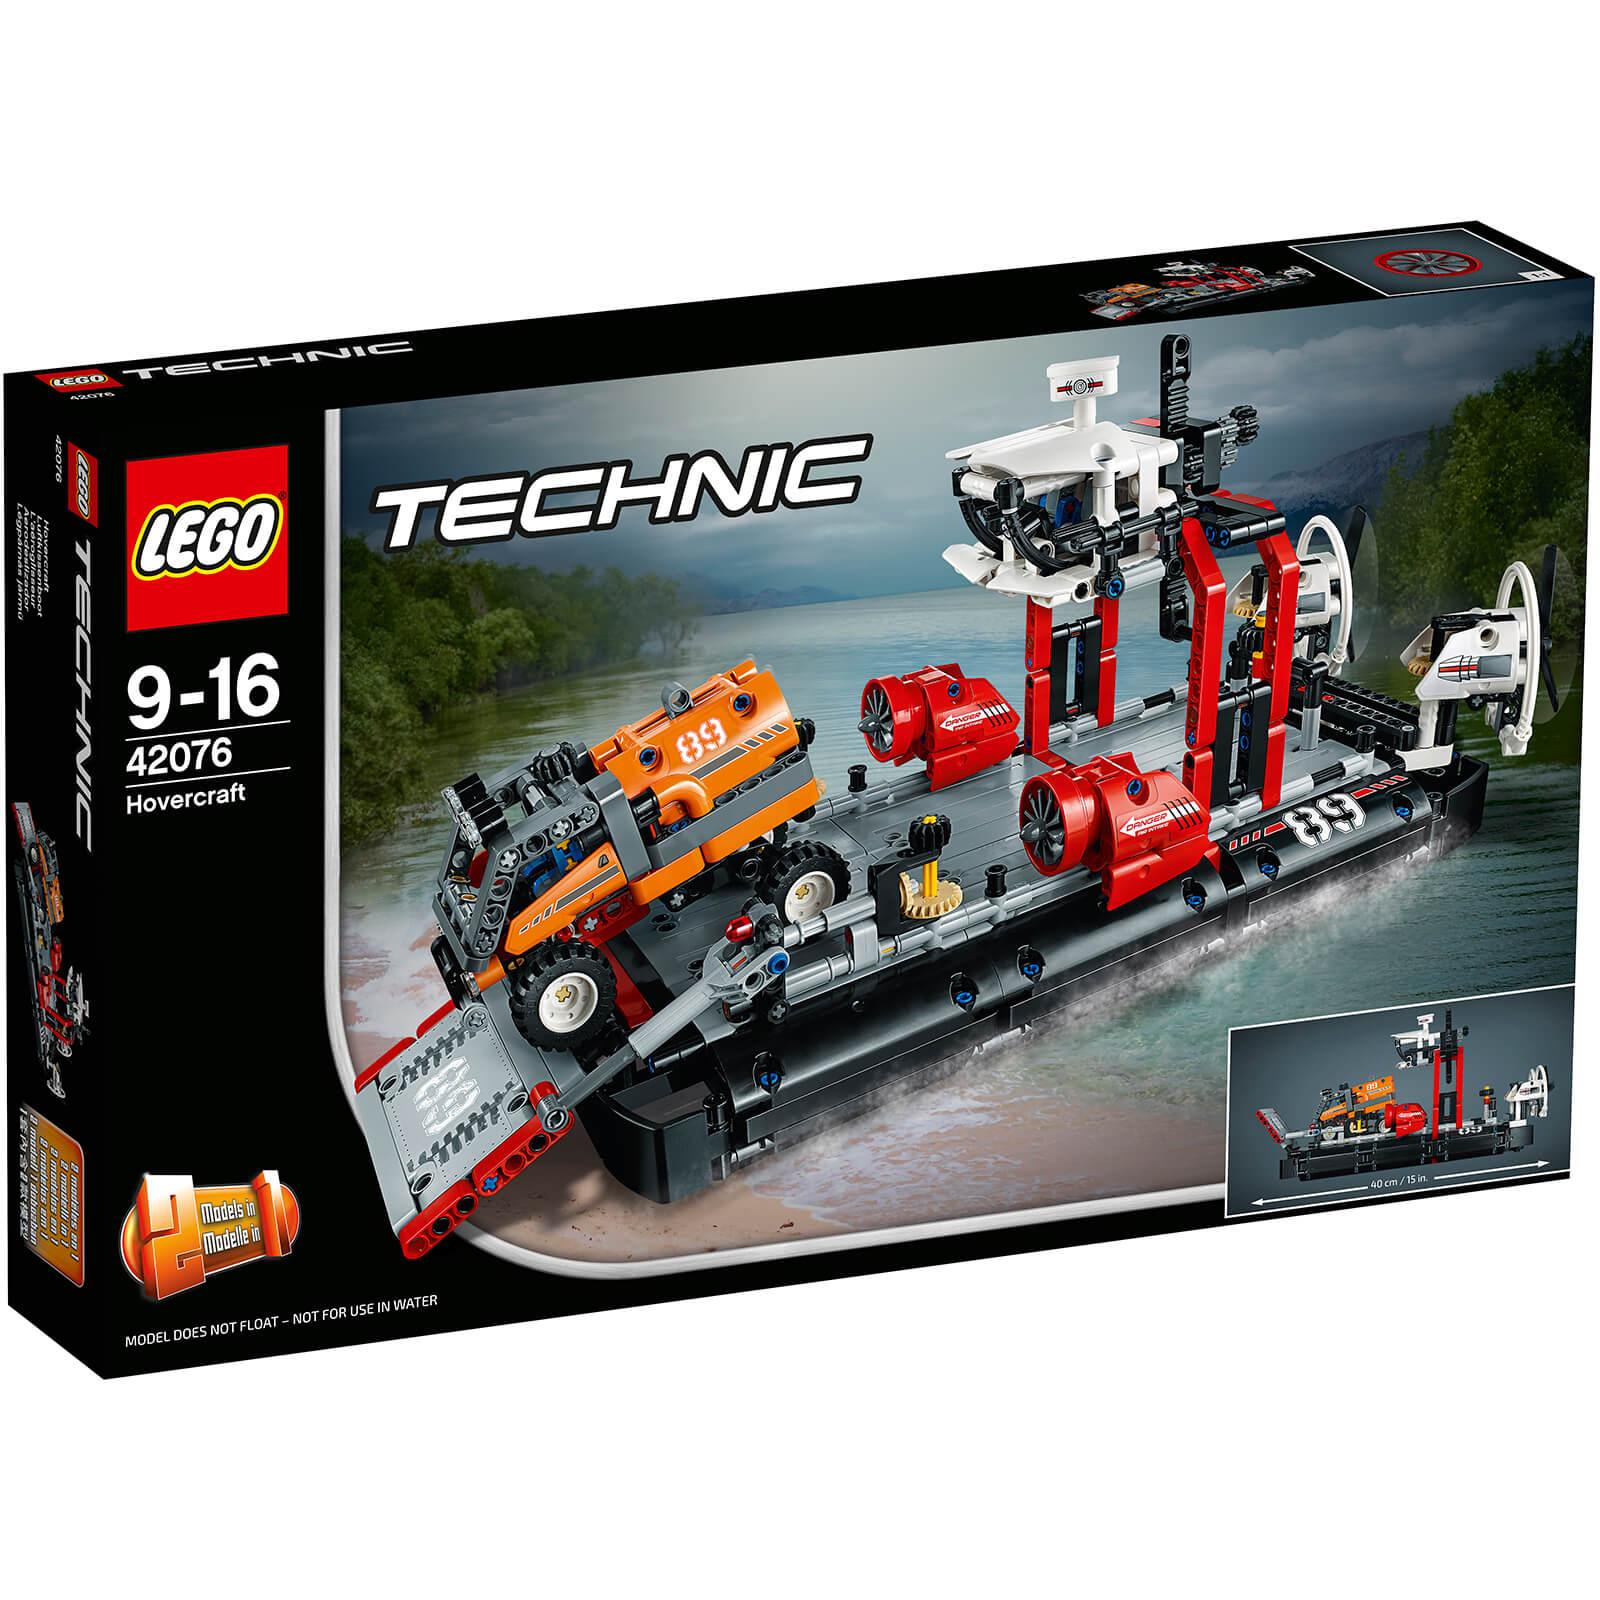 LEGO 42076 Technic Hovercraft £49.99 w/code @ IWOOT